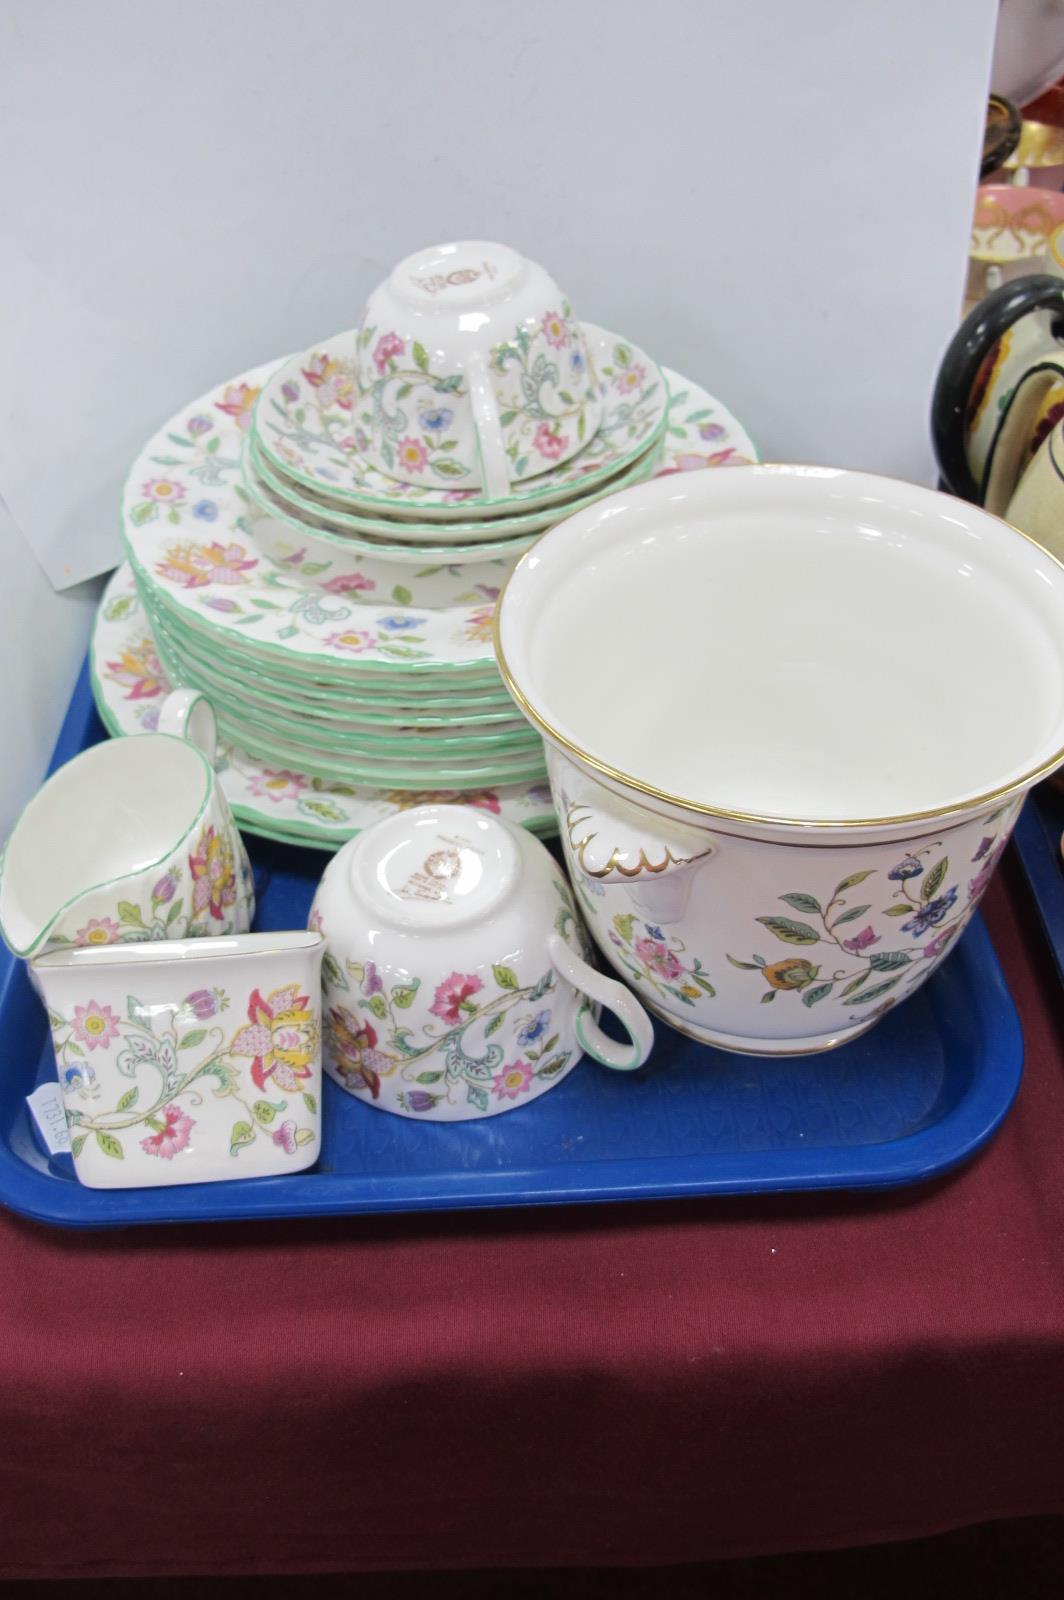 Minton Haddon Hall - two dinner plates, eight medium plates, three saucers, two cups, milk jug,